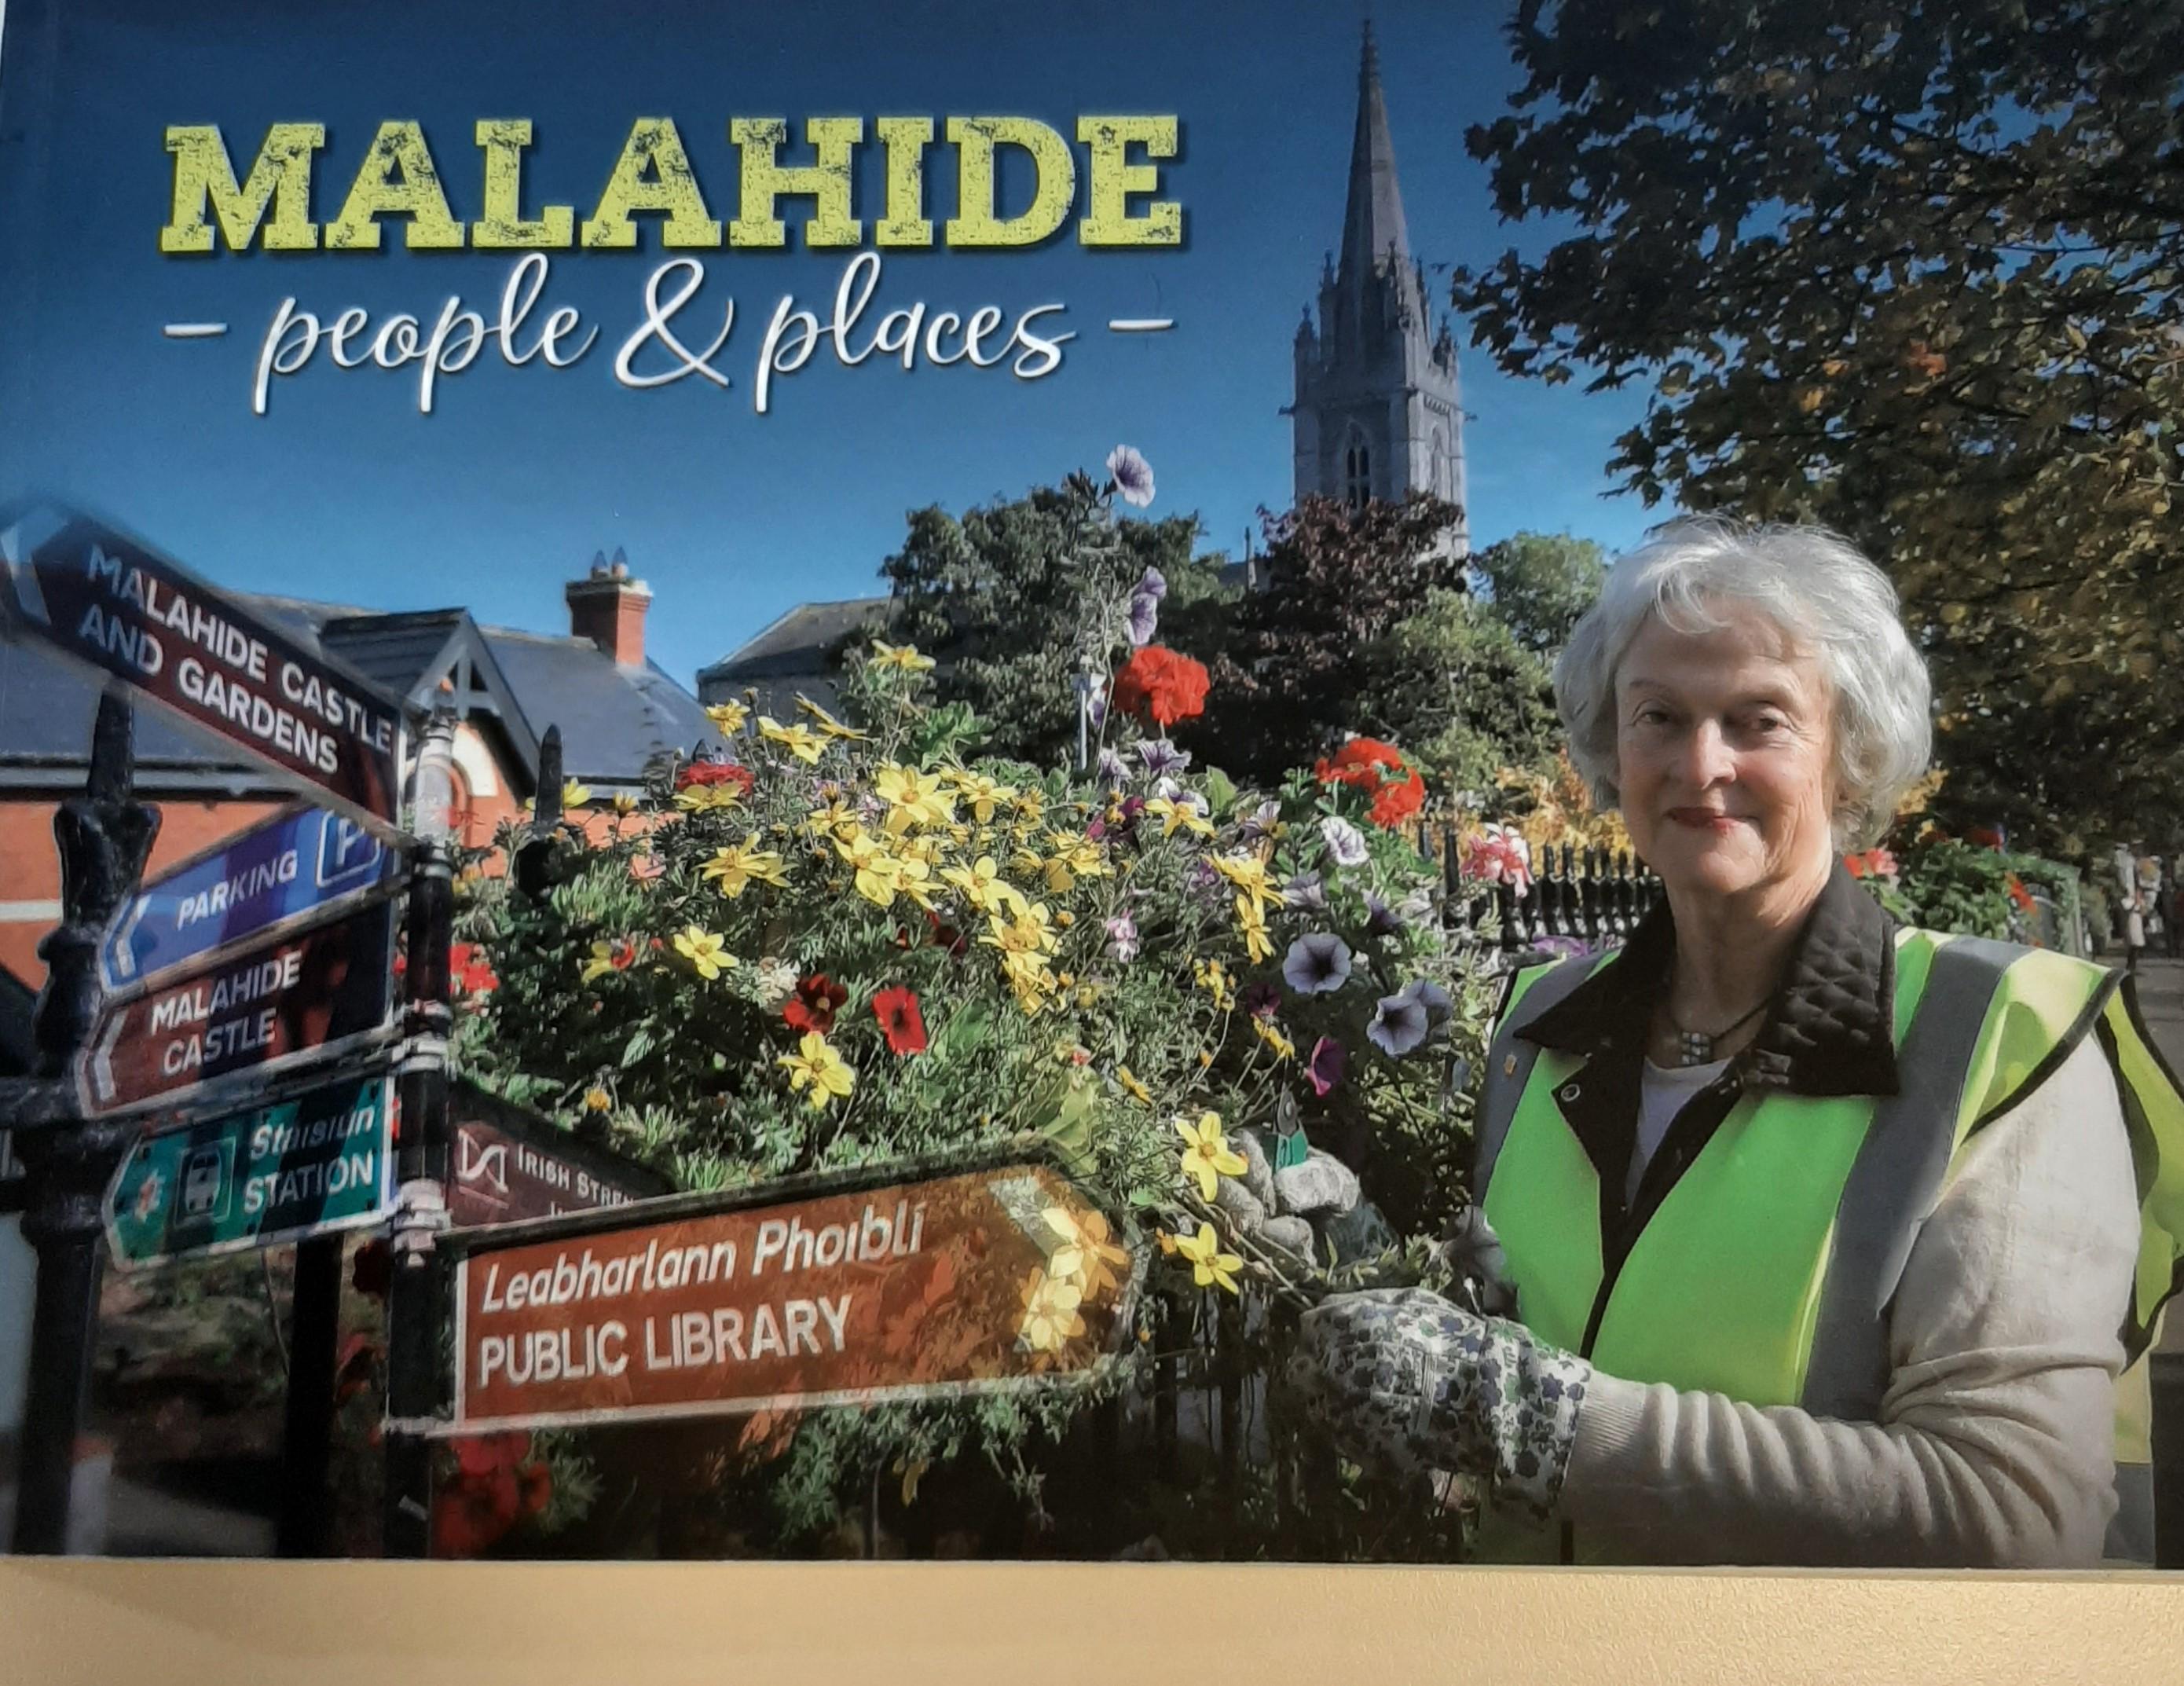 Malahide People & Places